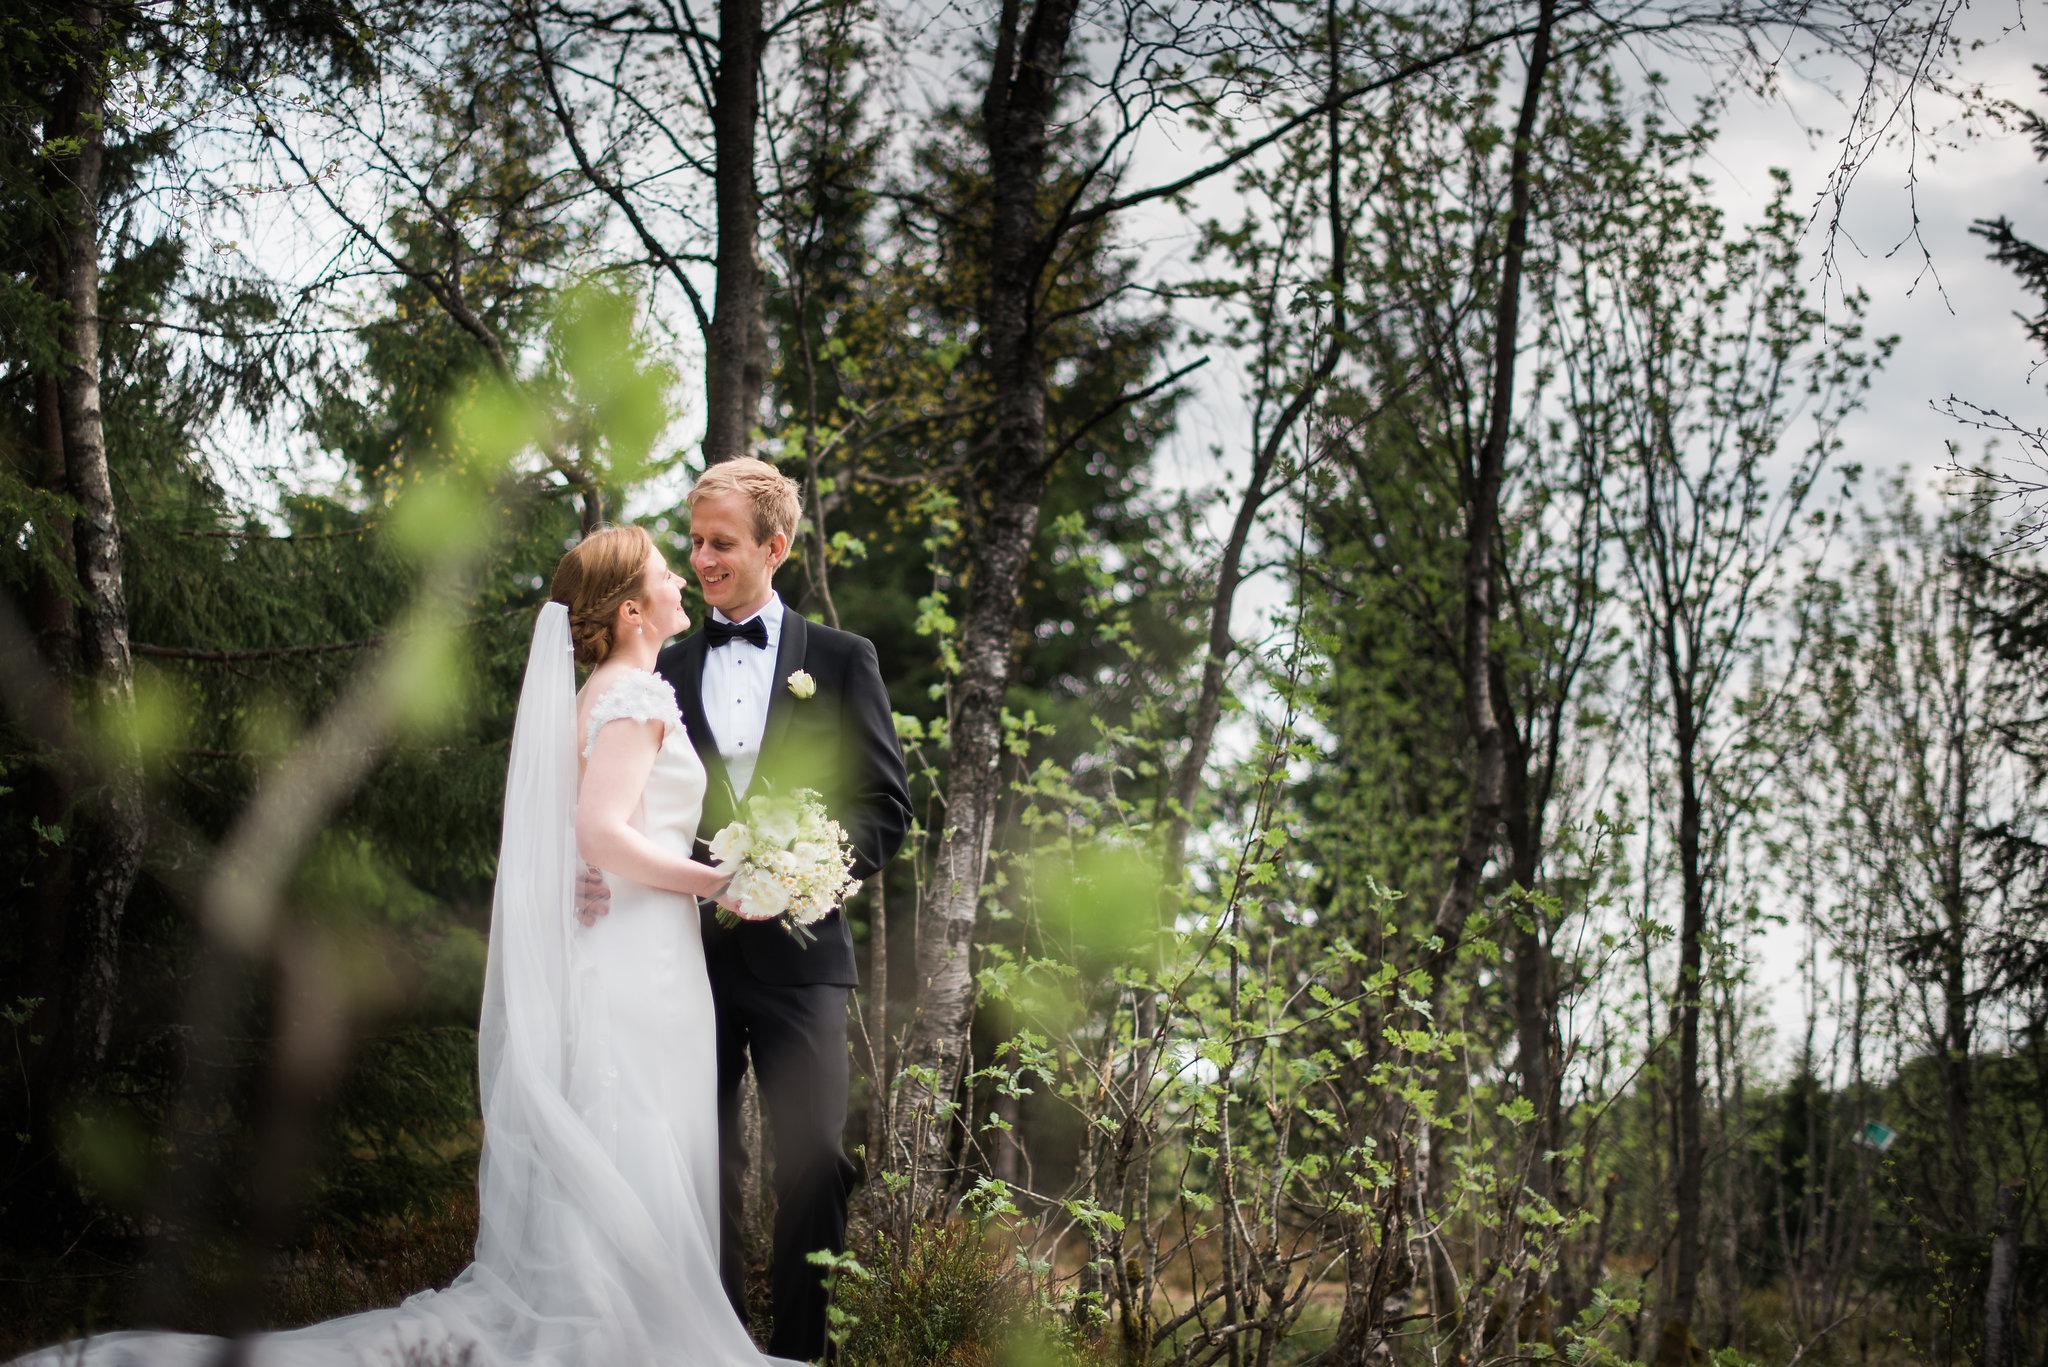 Pixlight-Bryllup-Nina-Thorbjorn569fotograf-holmekolen-oslo.jpg